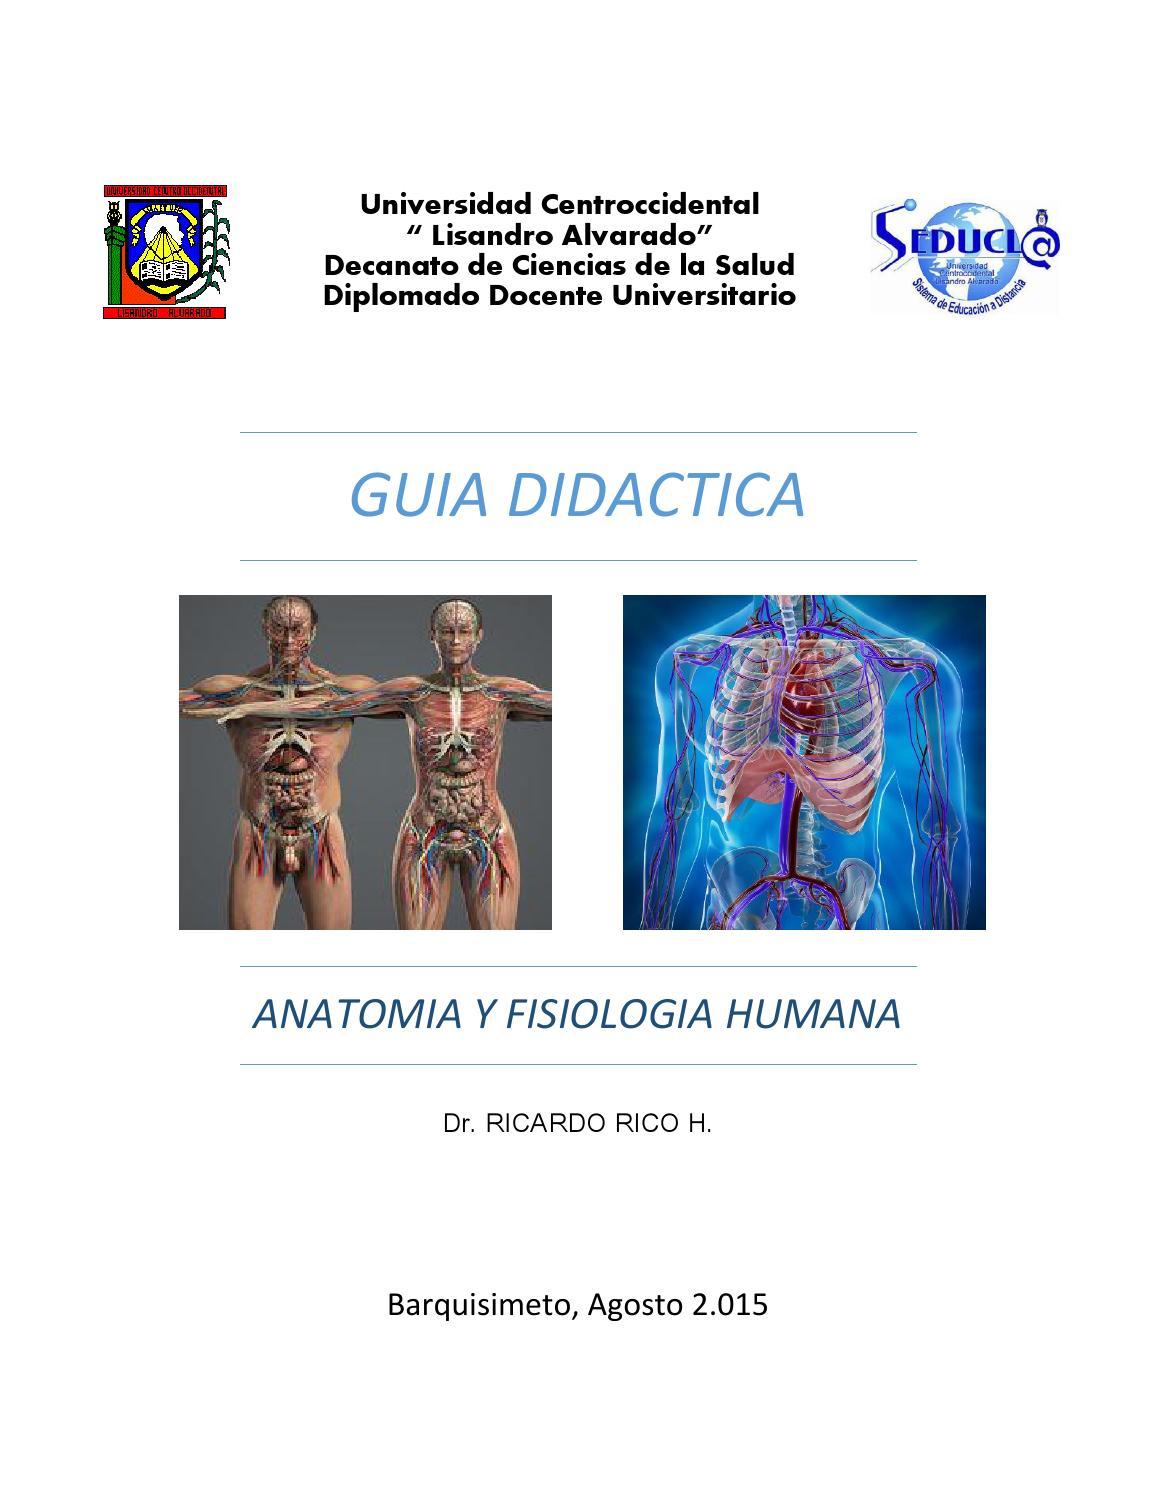 Guia didactica de anatomia y fisiologia humana by ricardo rico h - issuu